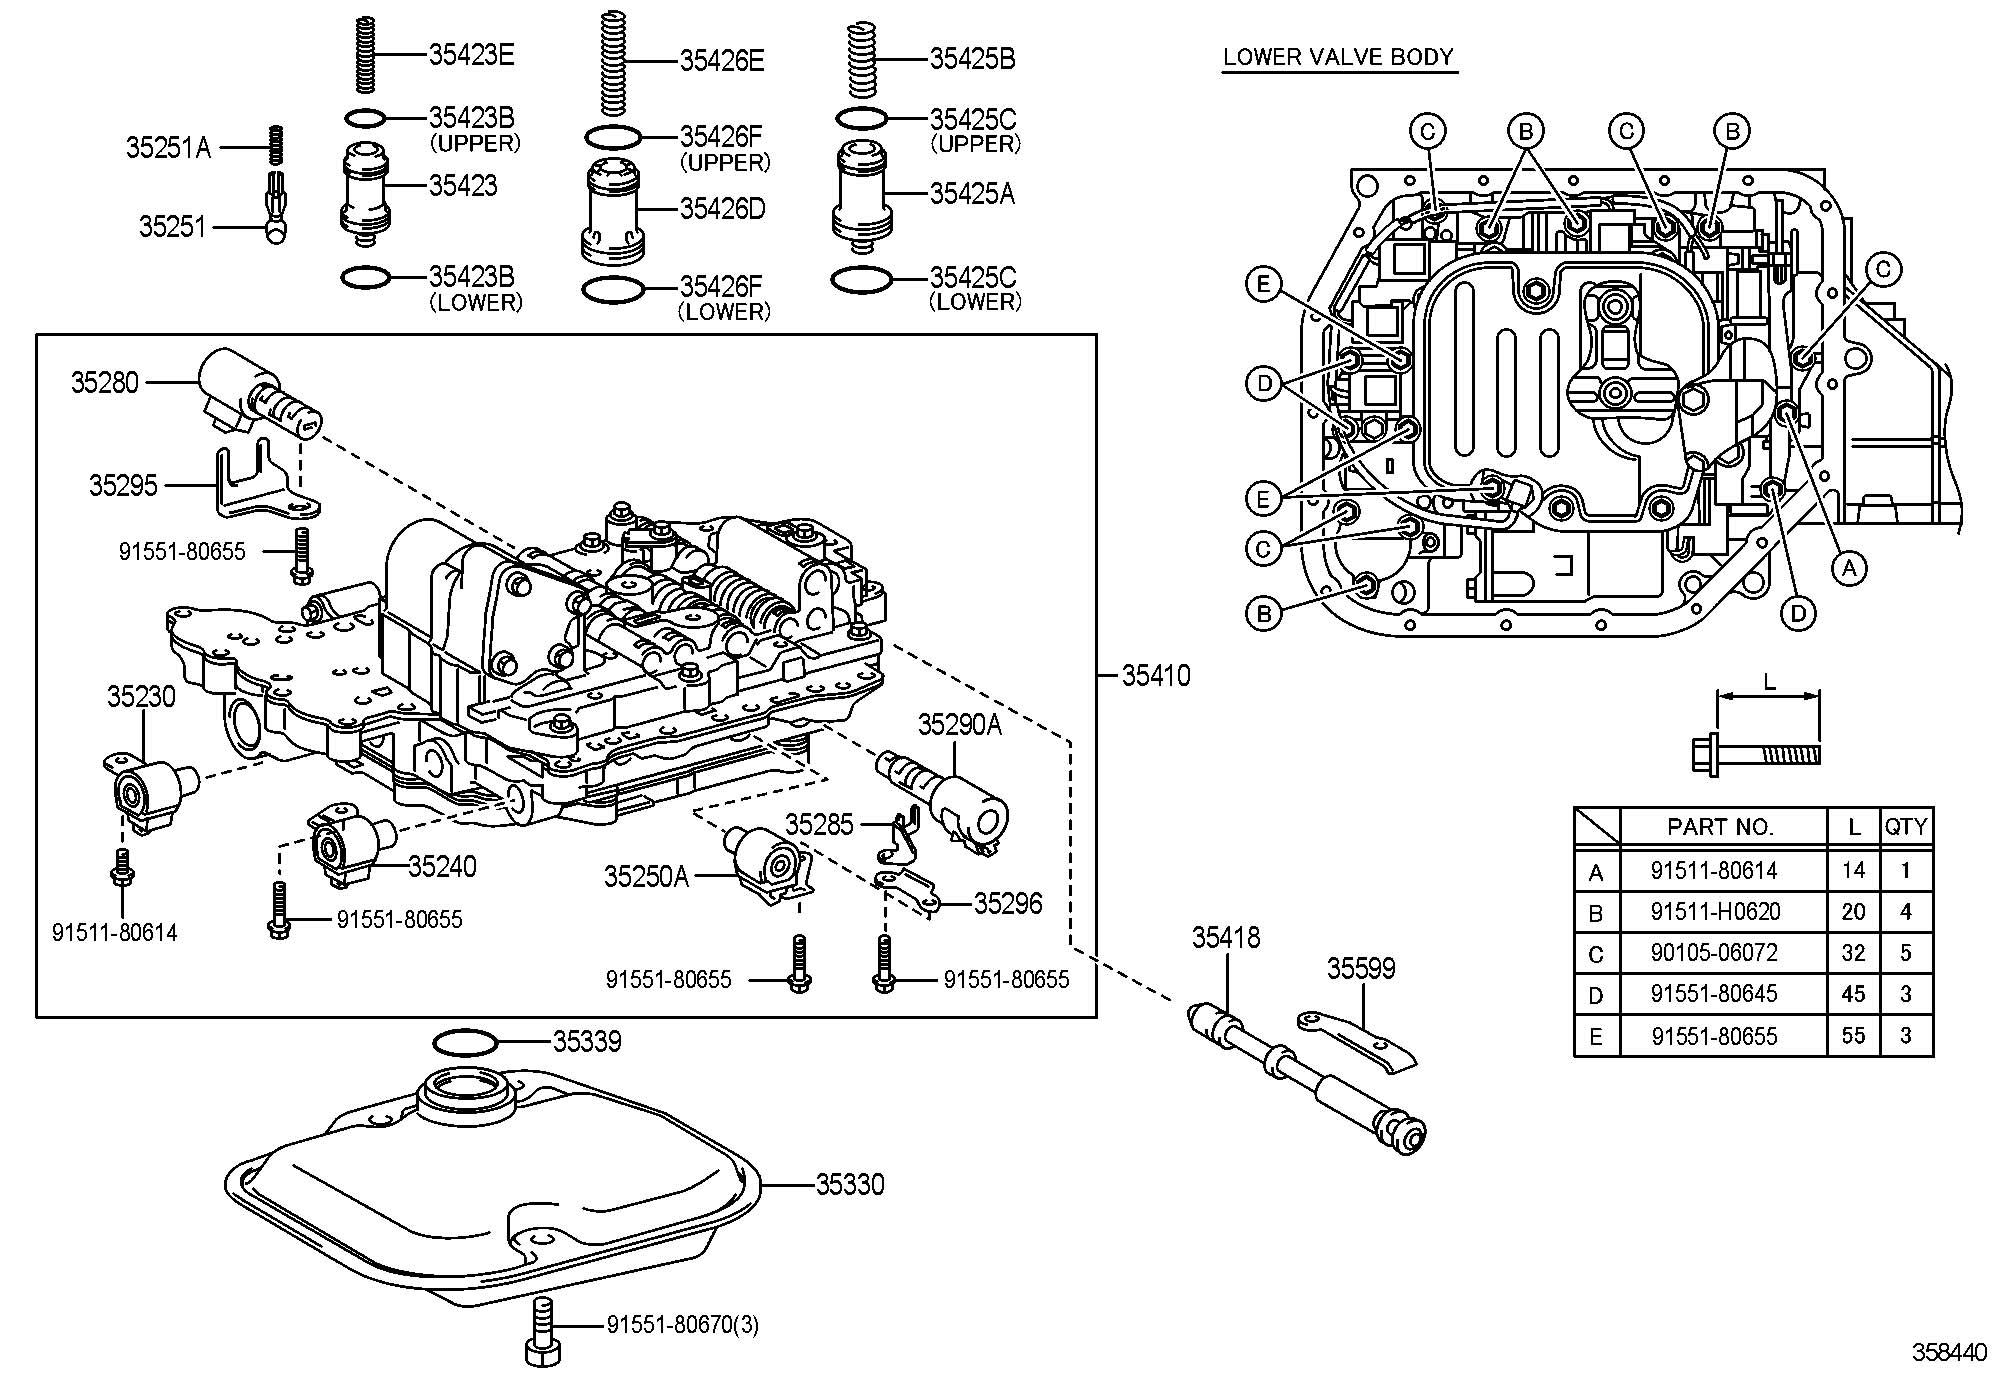 Toyota Corolla Body Assembly Transmission Valve Body